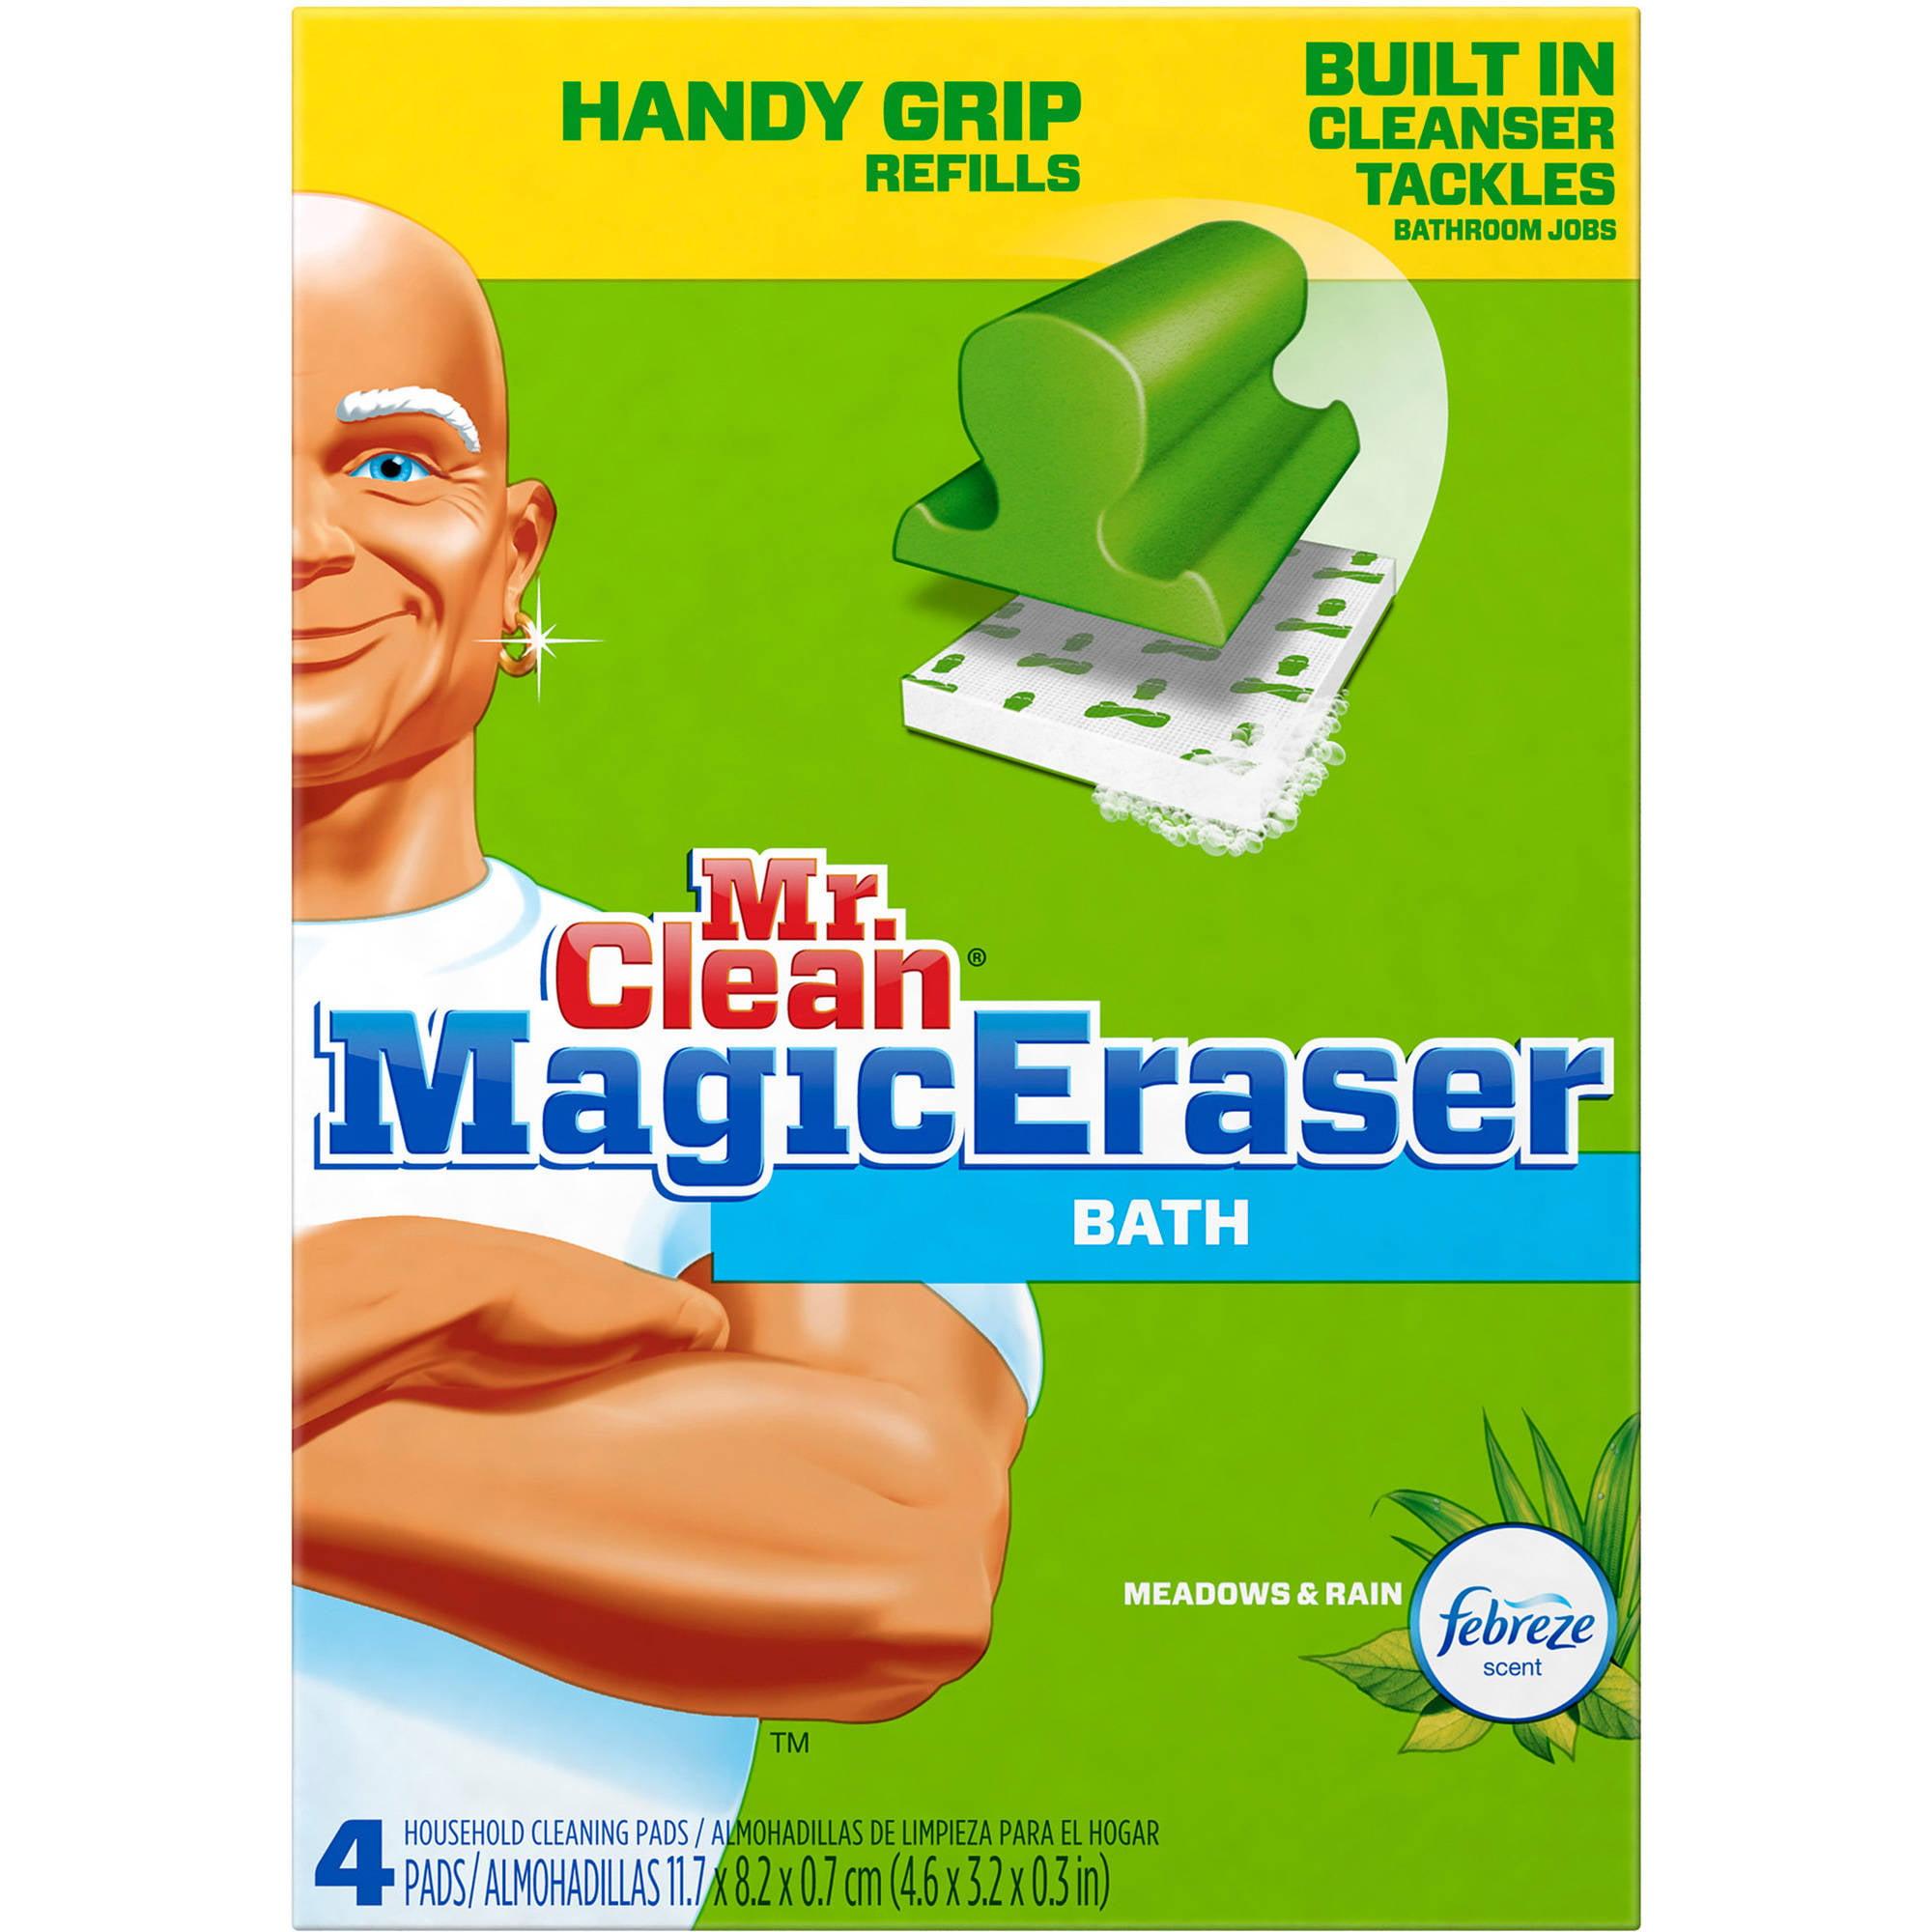 Mr Clean Magic Eraser Handy Grip Bathroom Cleaner Refills, 4 count